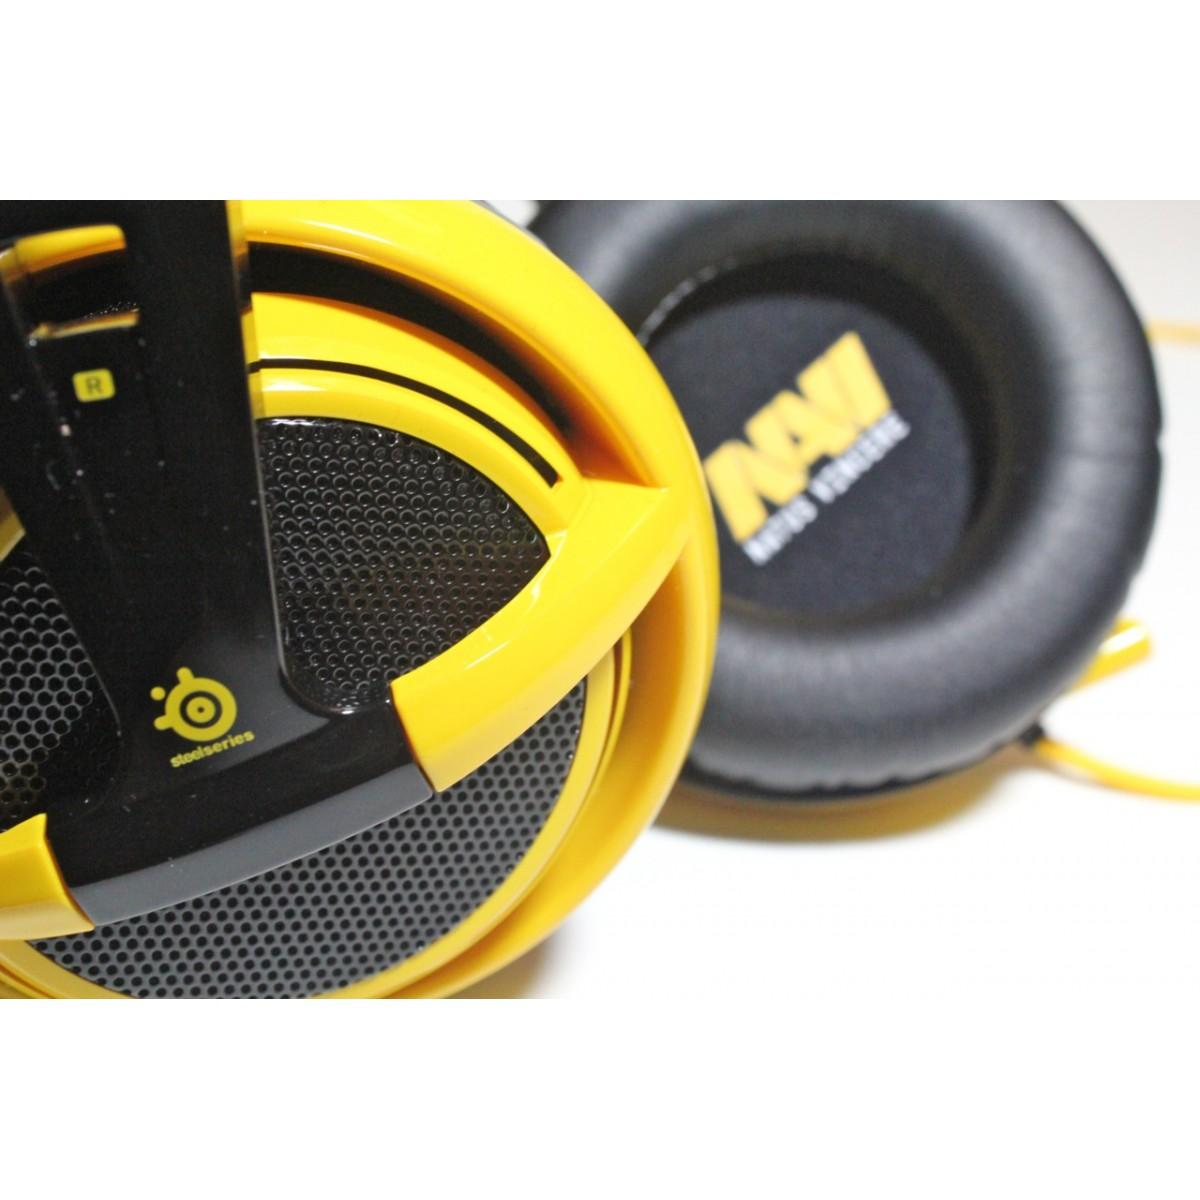 Headset Siberia V2 Navi Natus Vincere com Microfone 51111 - Steelseries